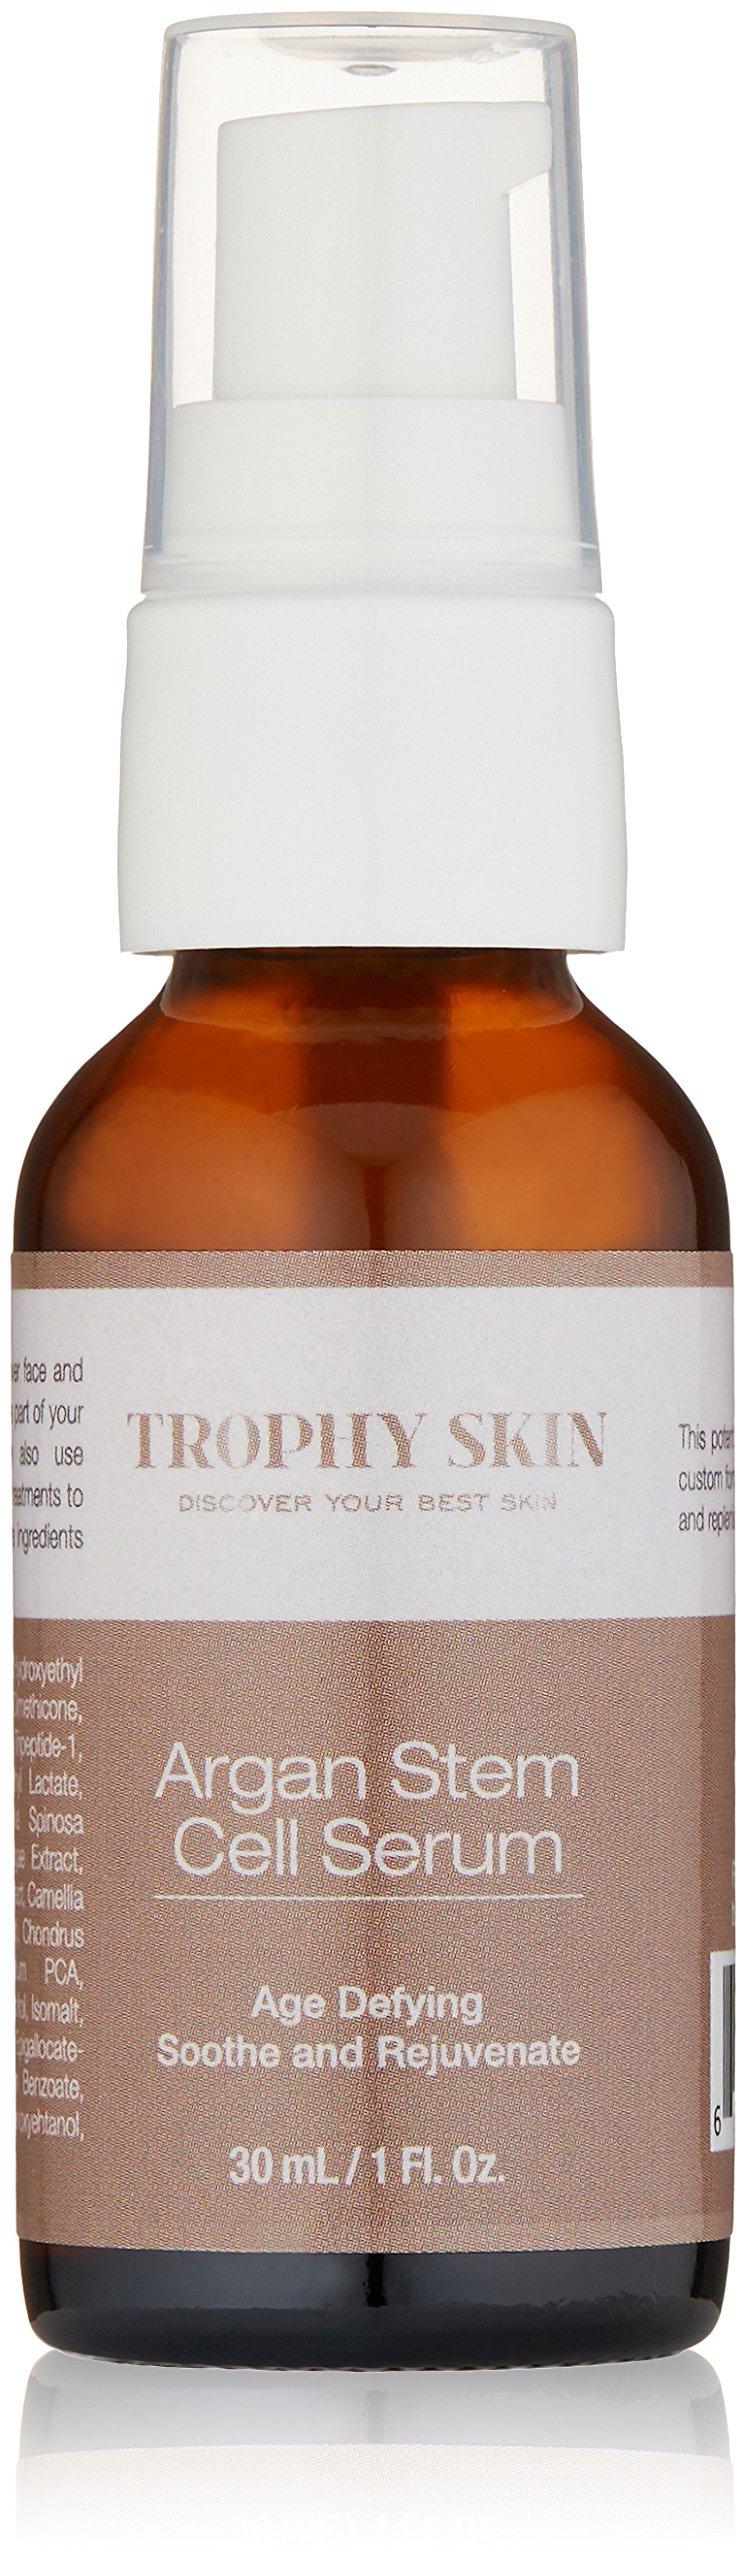 Trophy Skin Argan Stem Cell Serum, 1 Fl Oz